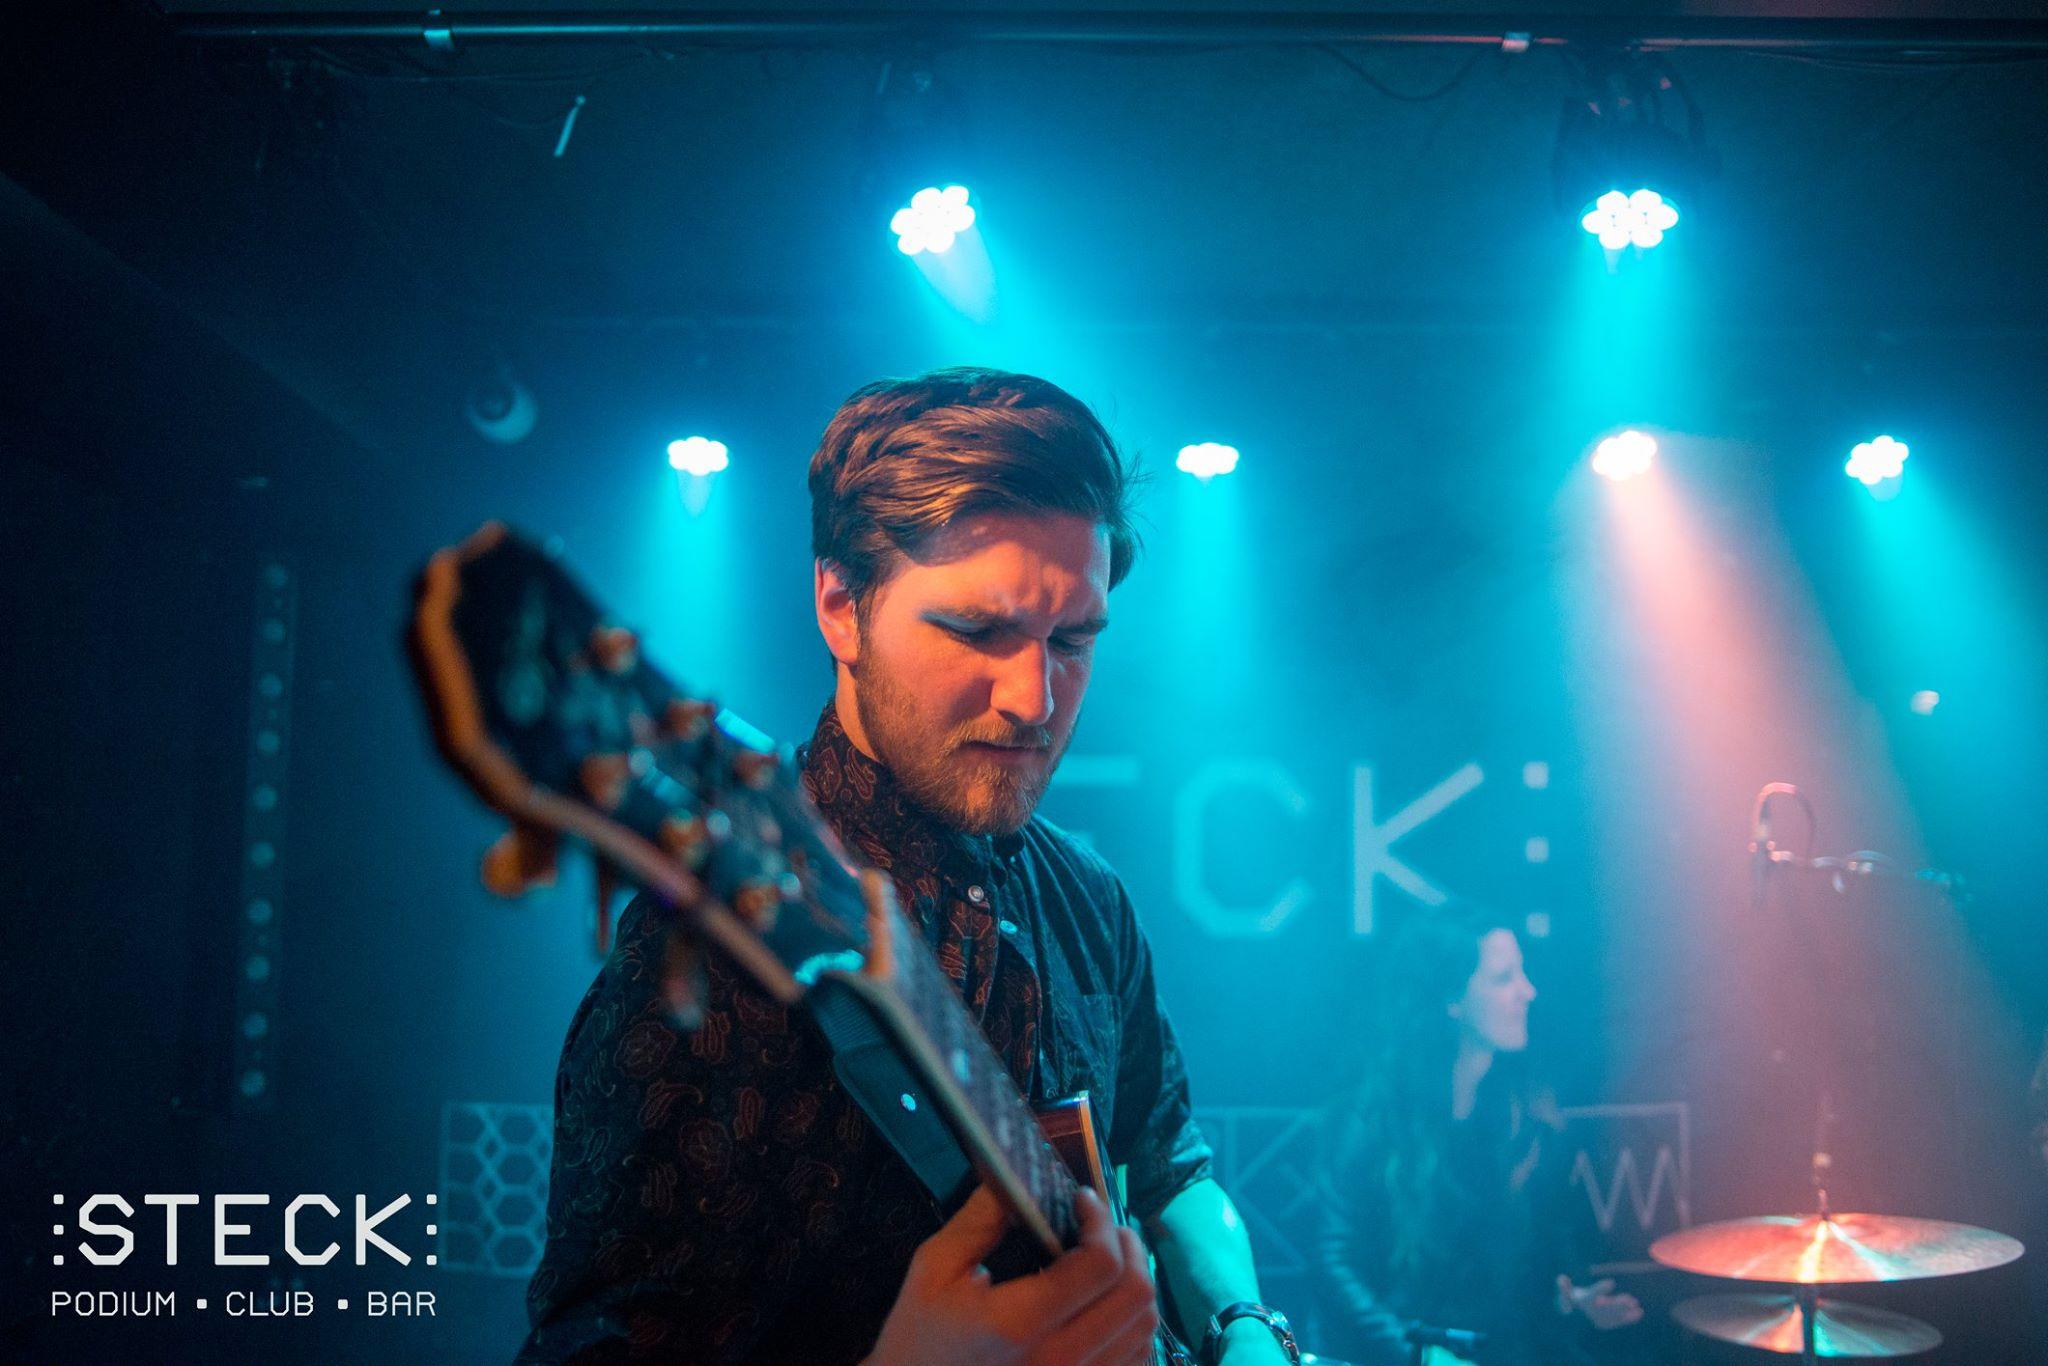 LIVE AT STECK (DELFT - NL)